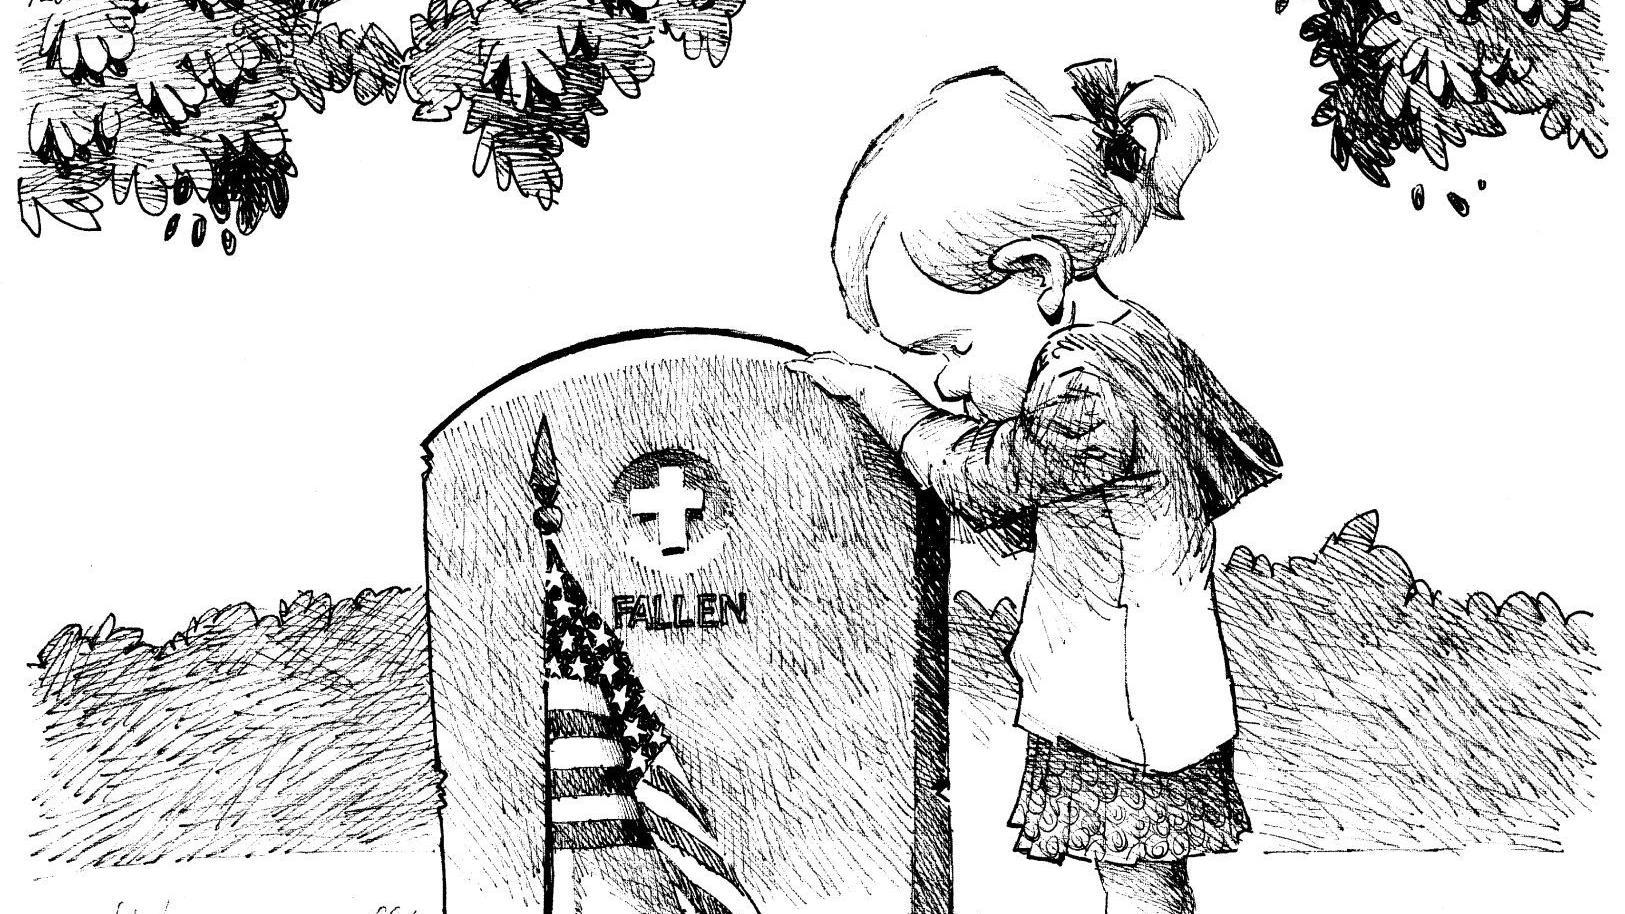 A child remembers the fallen, in John Darkow's latest